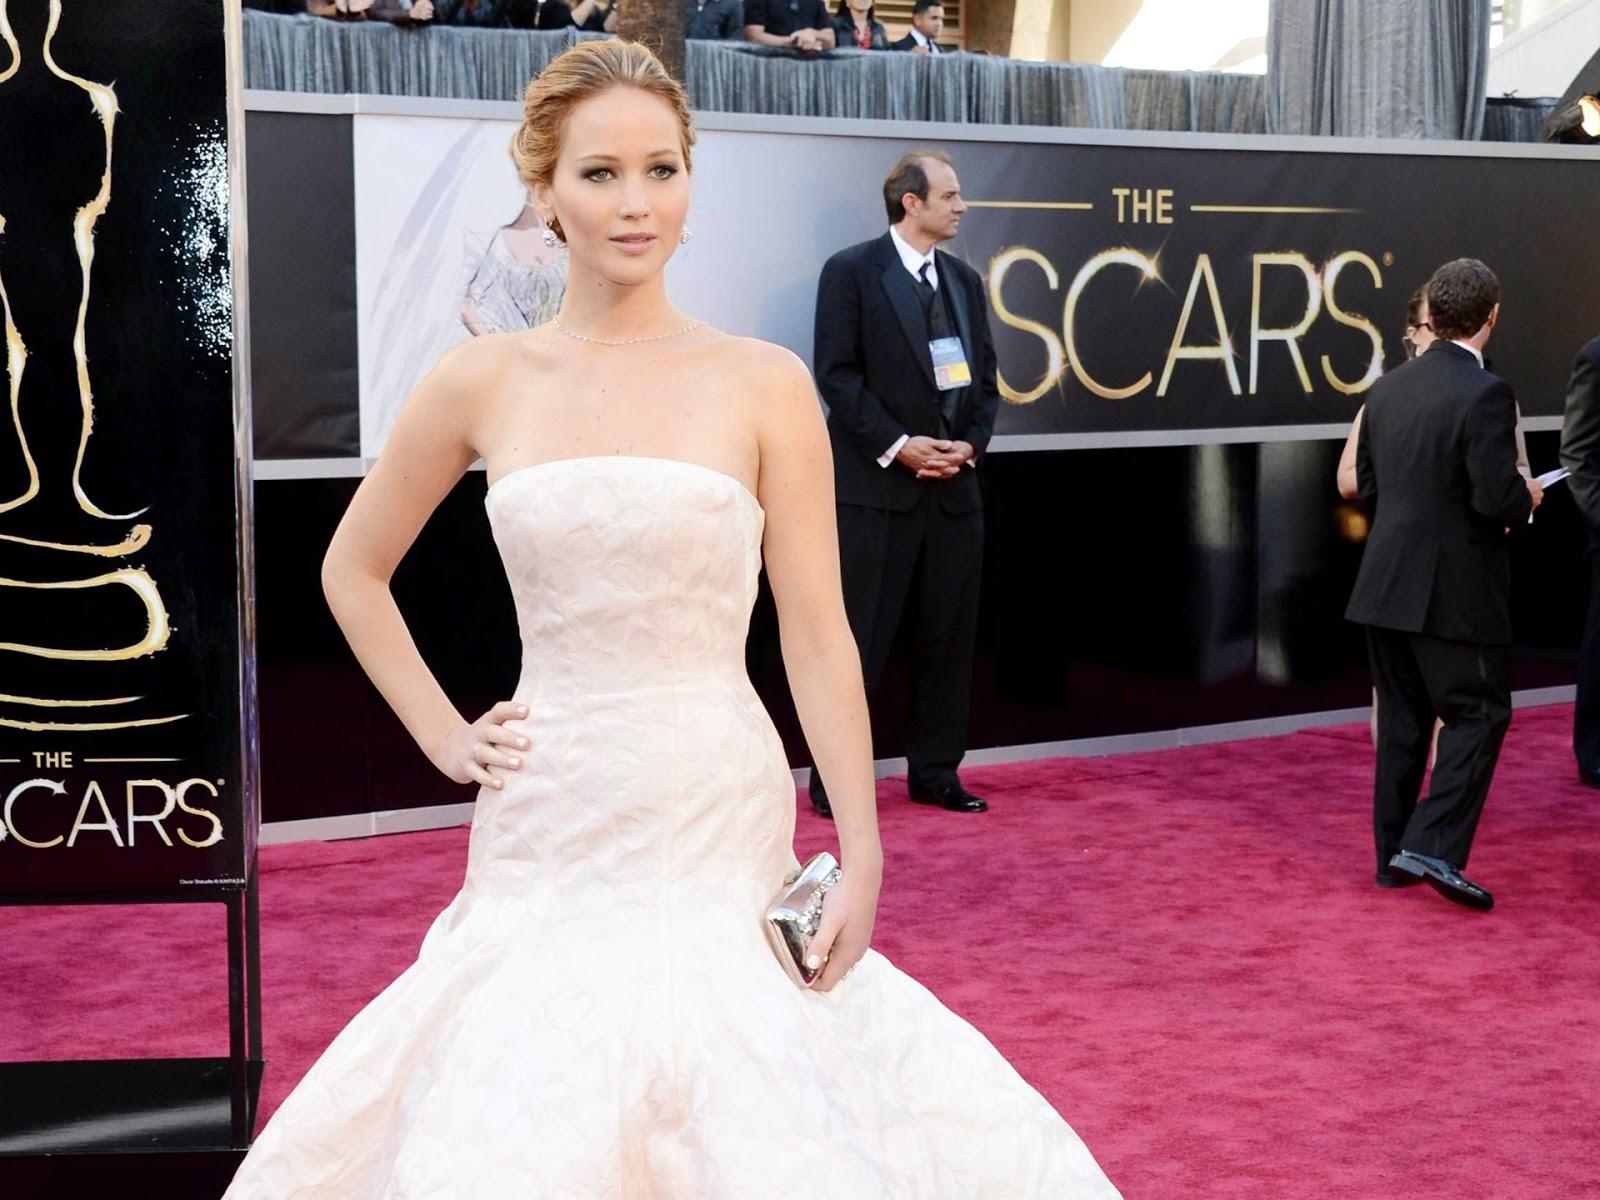 http://1.bp.blogspot.com/-QbUNoqoZ-M4/UStvot2WspI/AAAAAAAAHO4/OtsliGTM24Q/s1600/Jennifer-Lawrence-2013-Oscar-Awards-HD-Wallpaper-Vvallpaper.Net.jpg